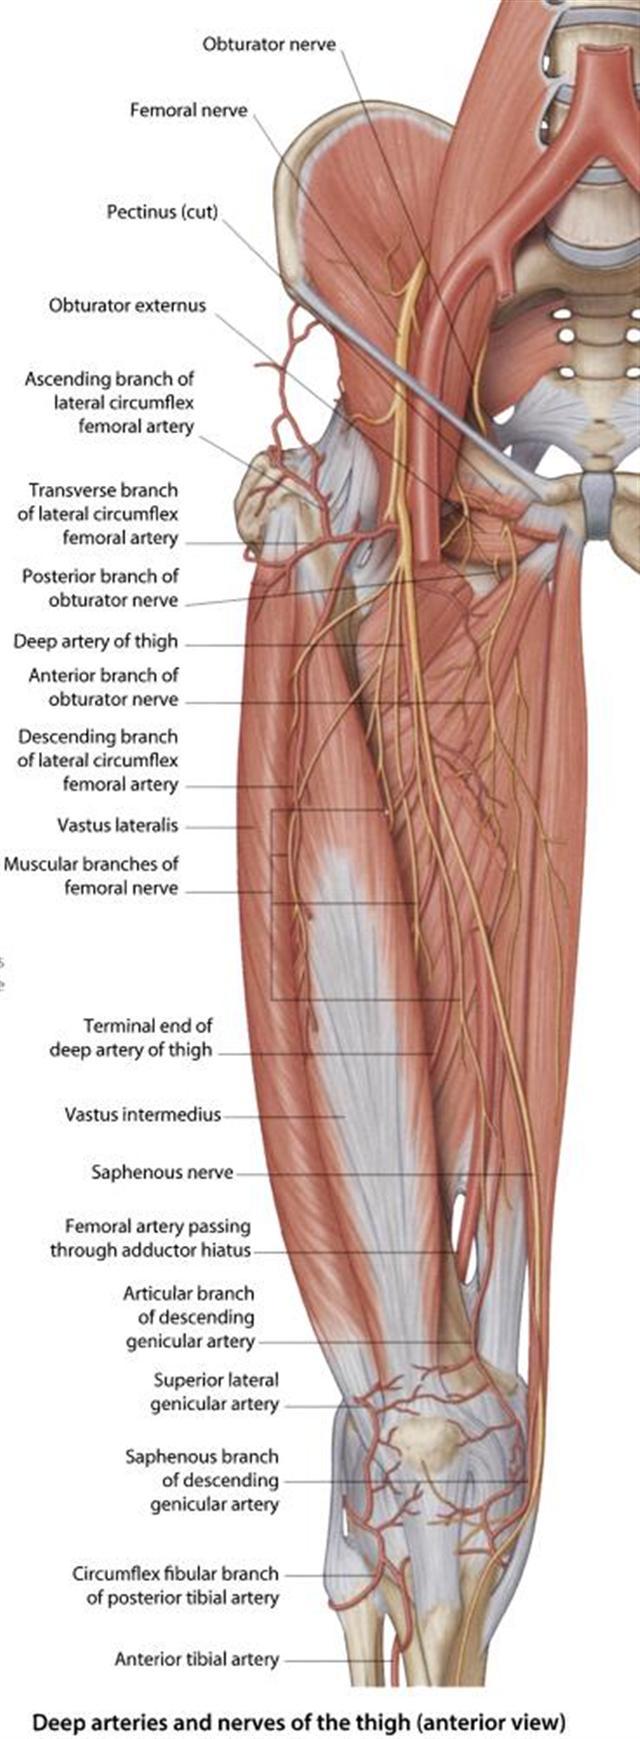 femoral nerve block - procedures consult japan, Muscles